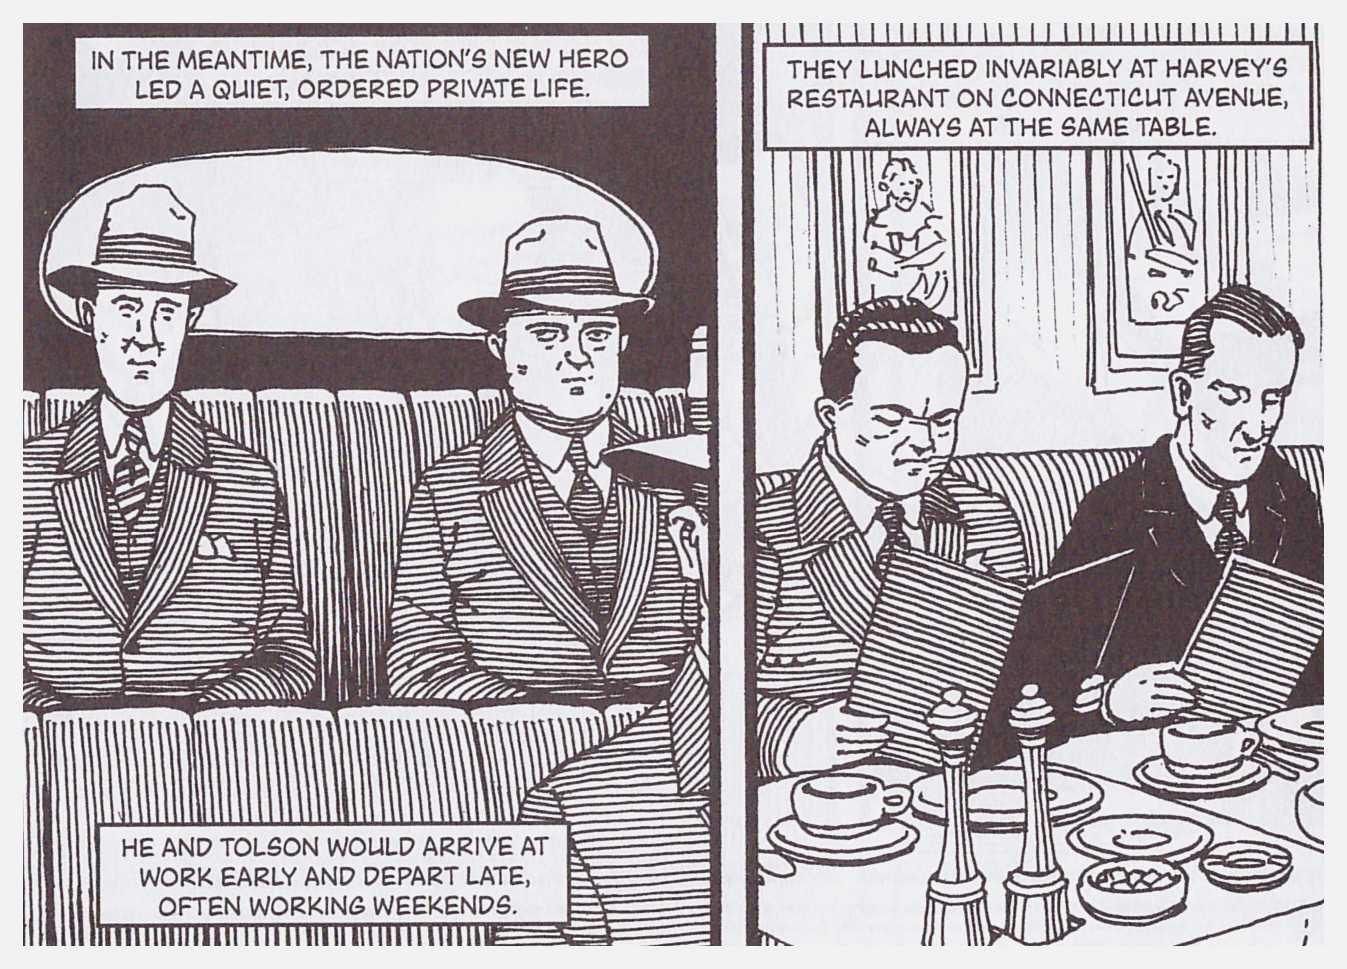 J. Edgar Hoover review